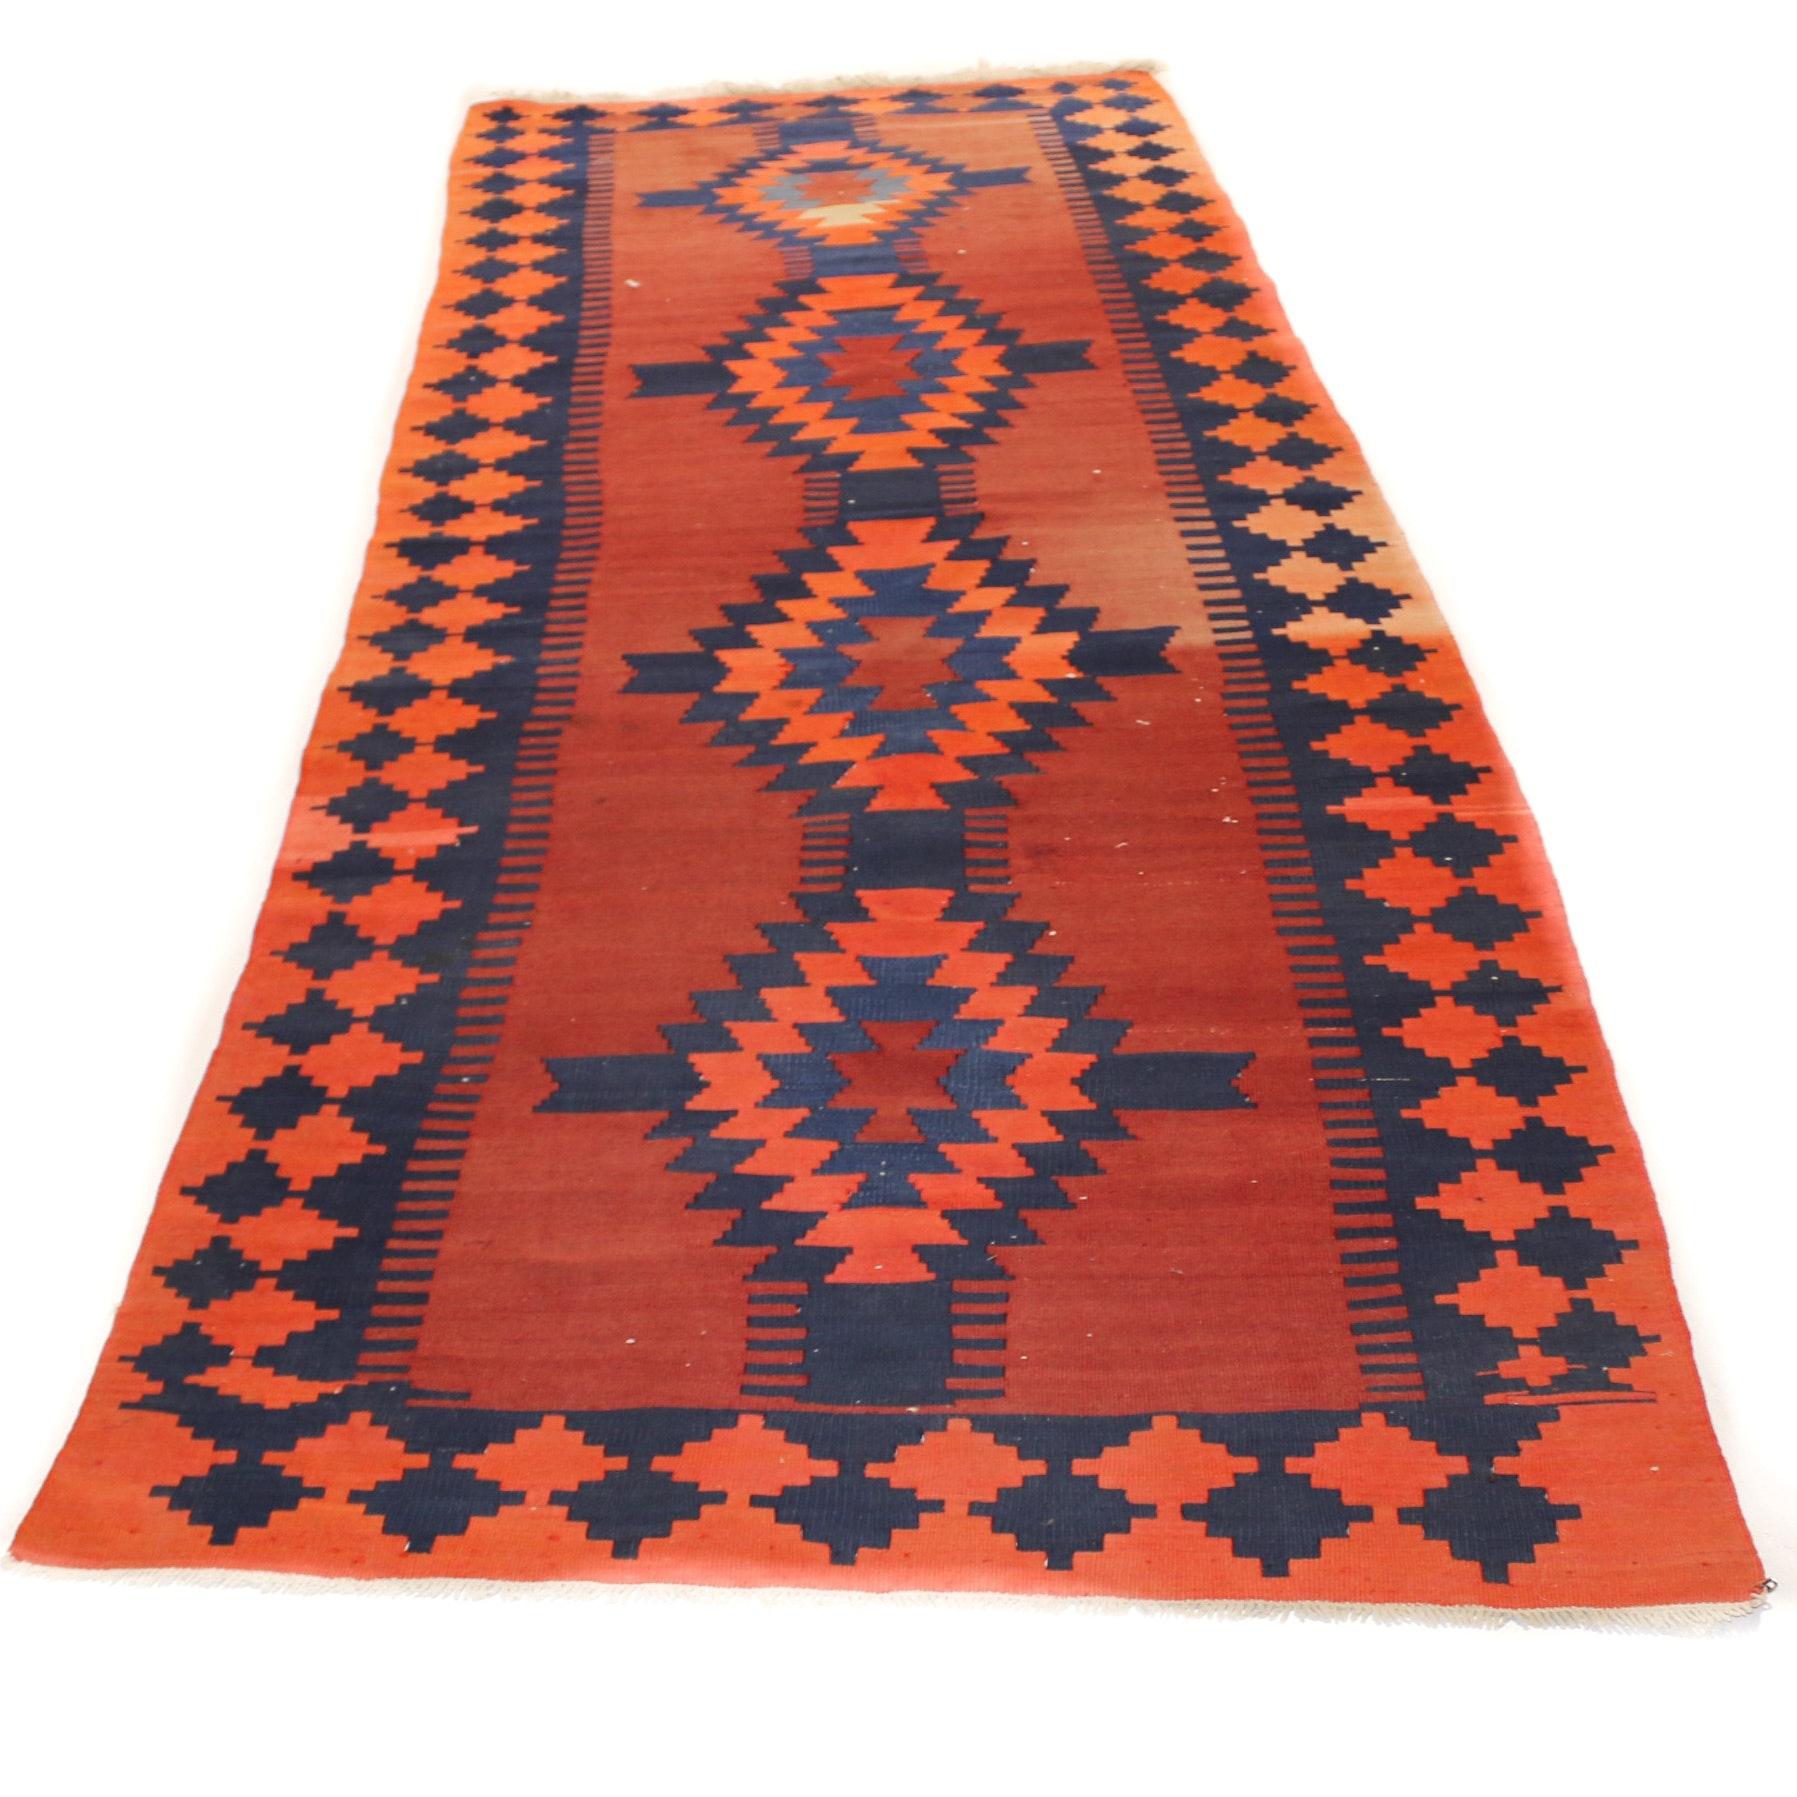 Hand-Knotted Turkish Kilim Long Rug